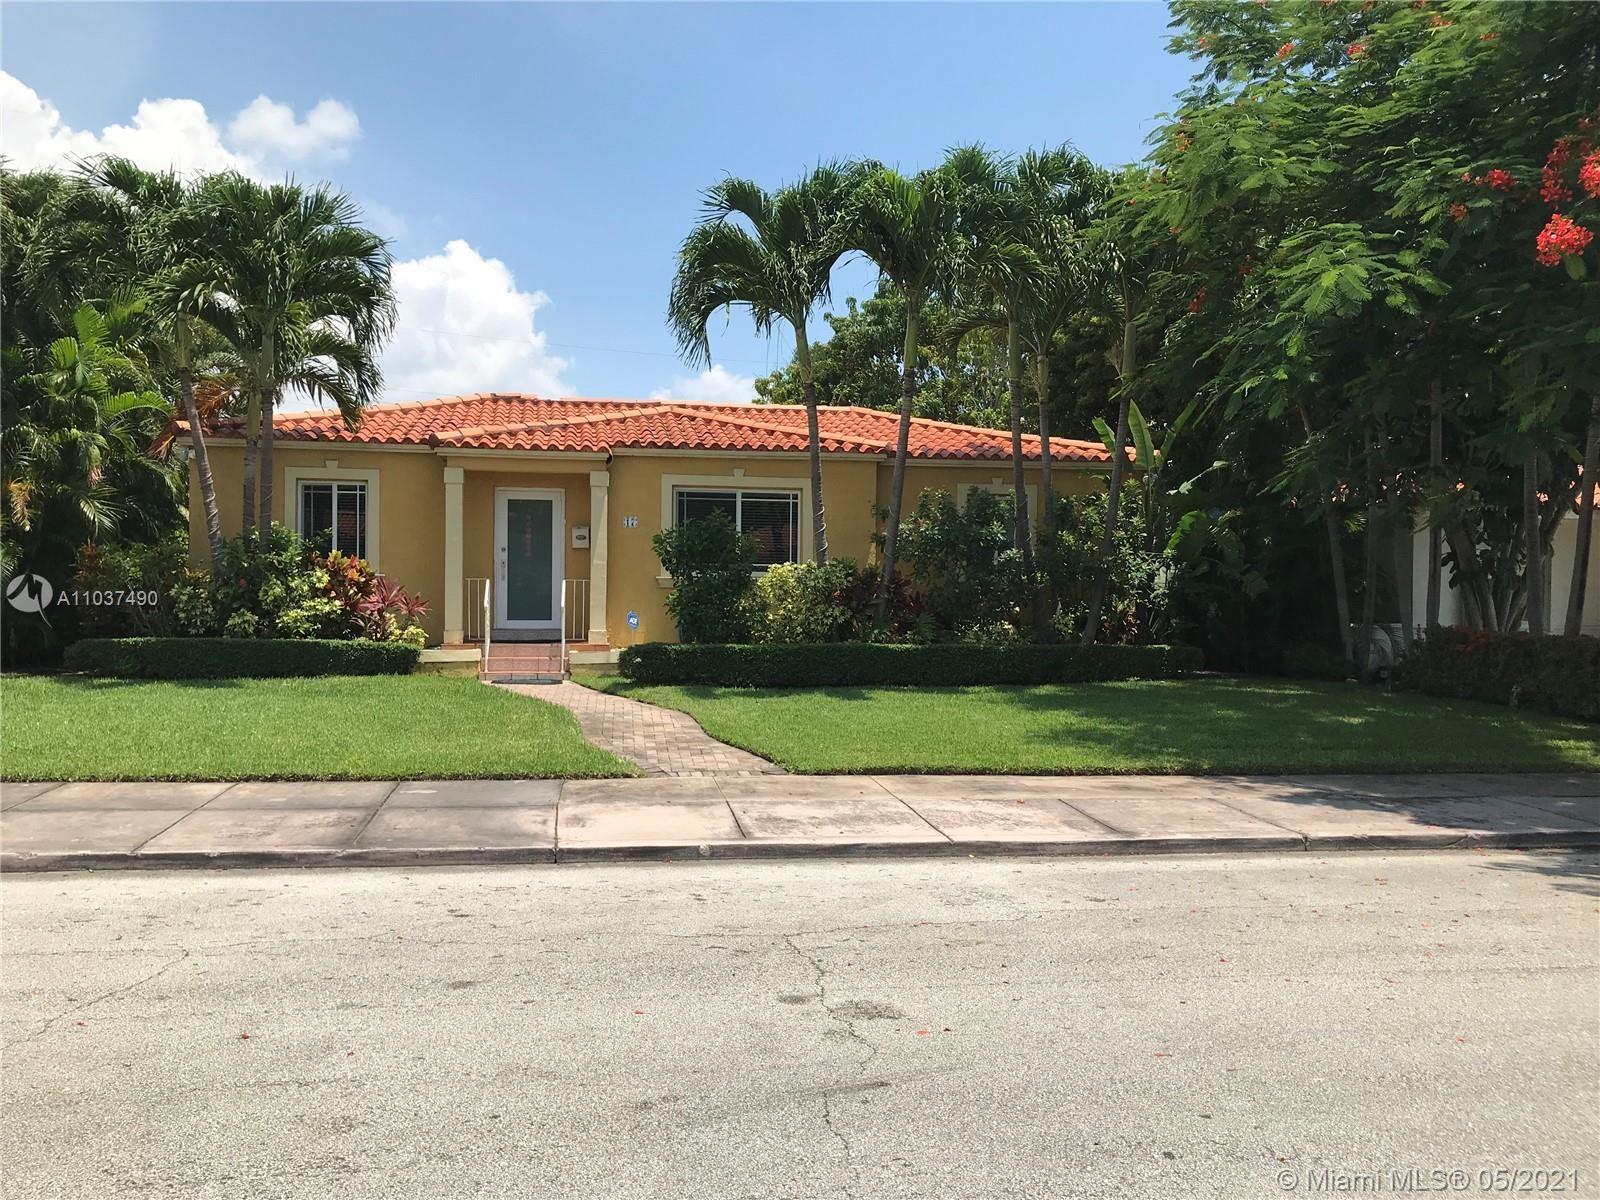 Photo of 17 Marabella Ave, Coral Gables, FL 33134 (MLS # A11037490)